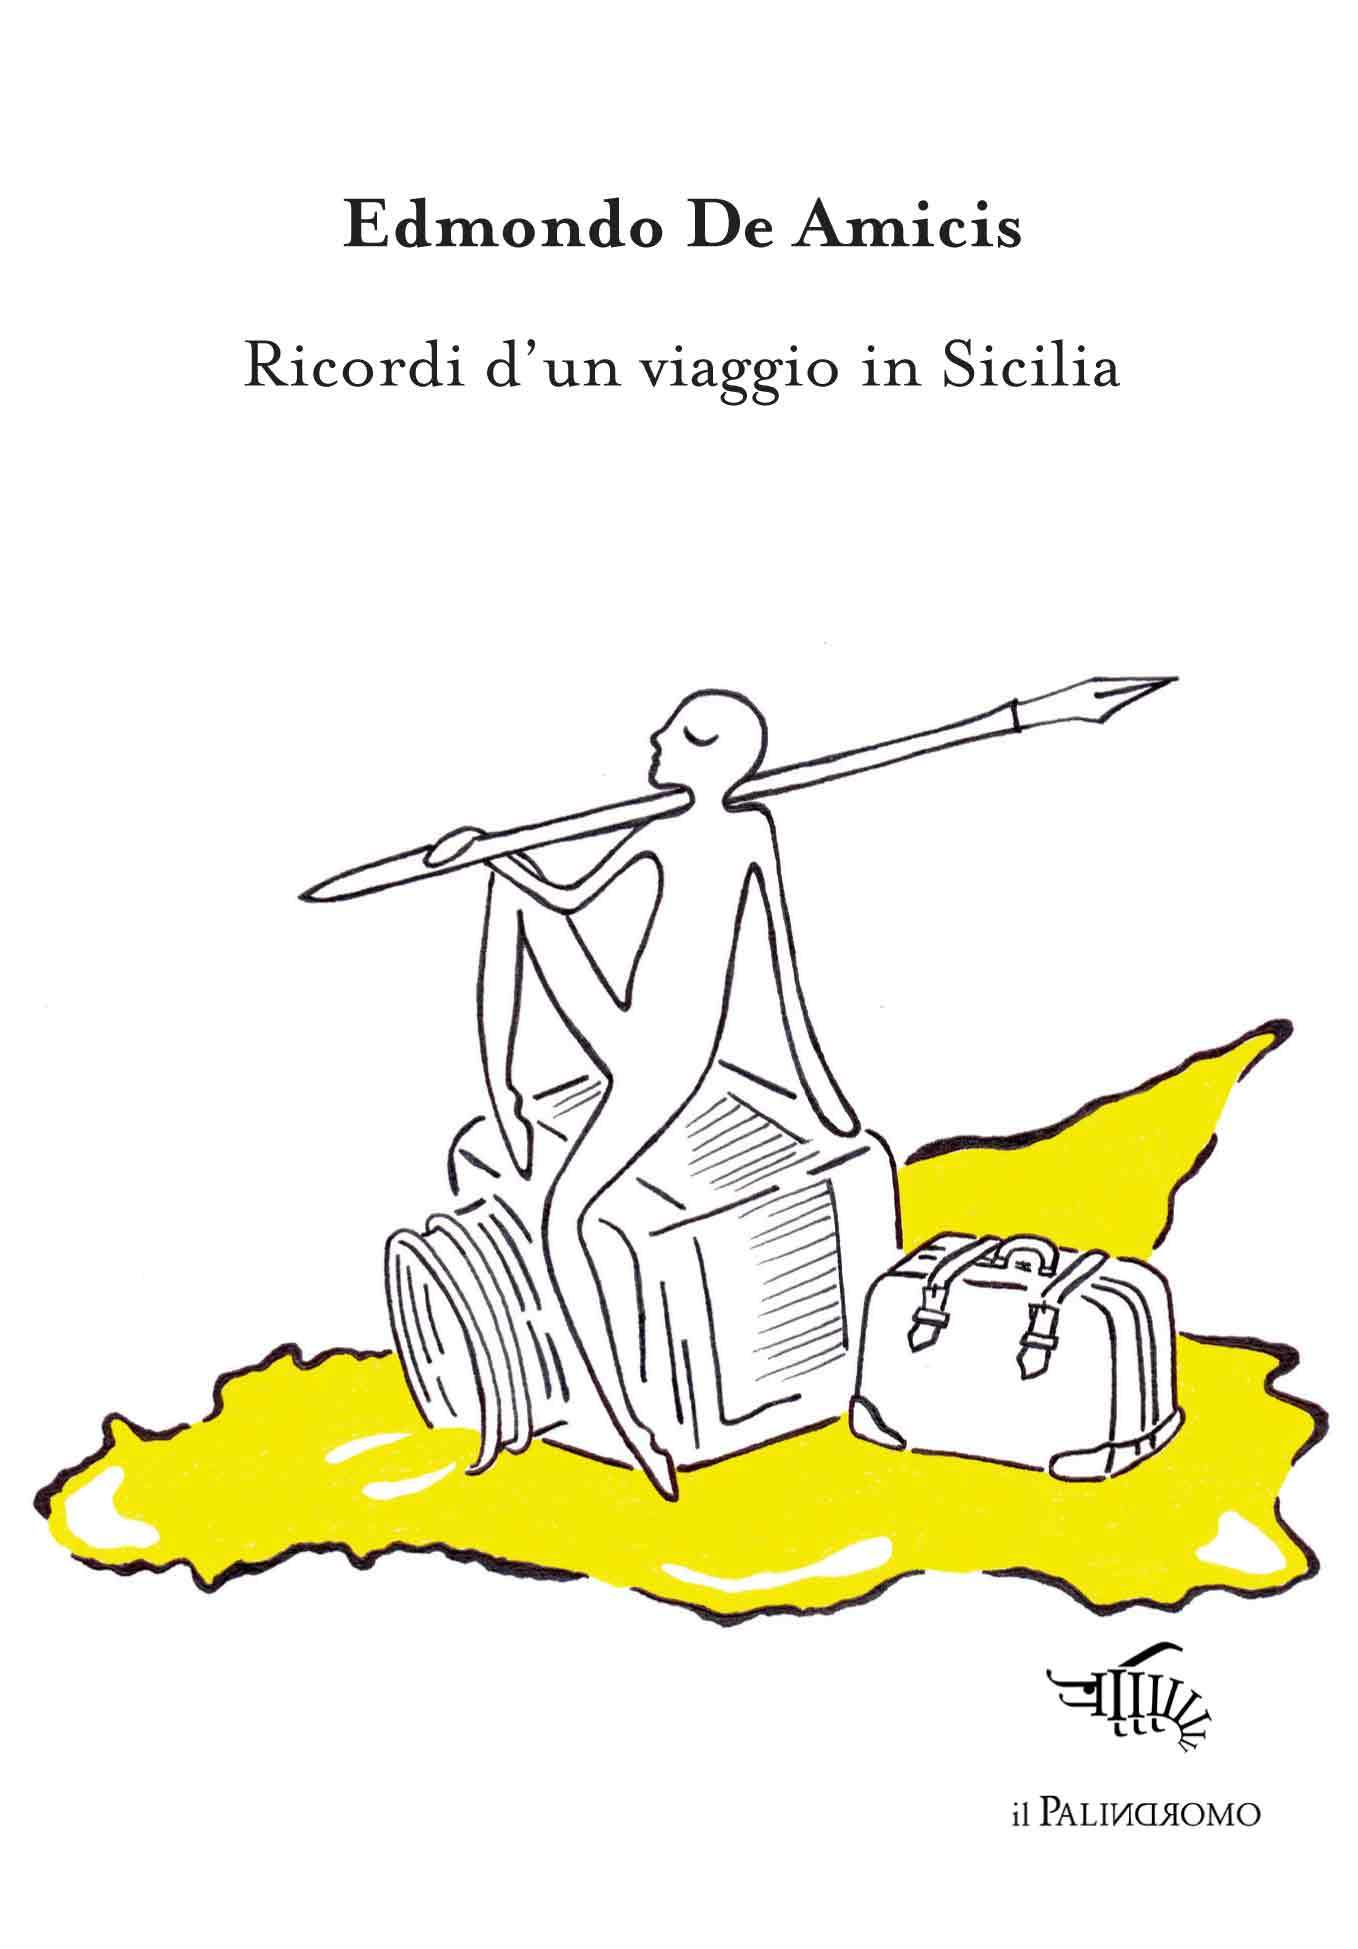 Autore: Edmondo De Amicis